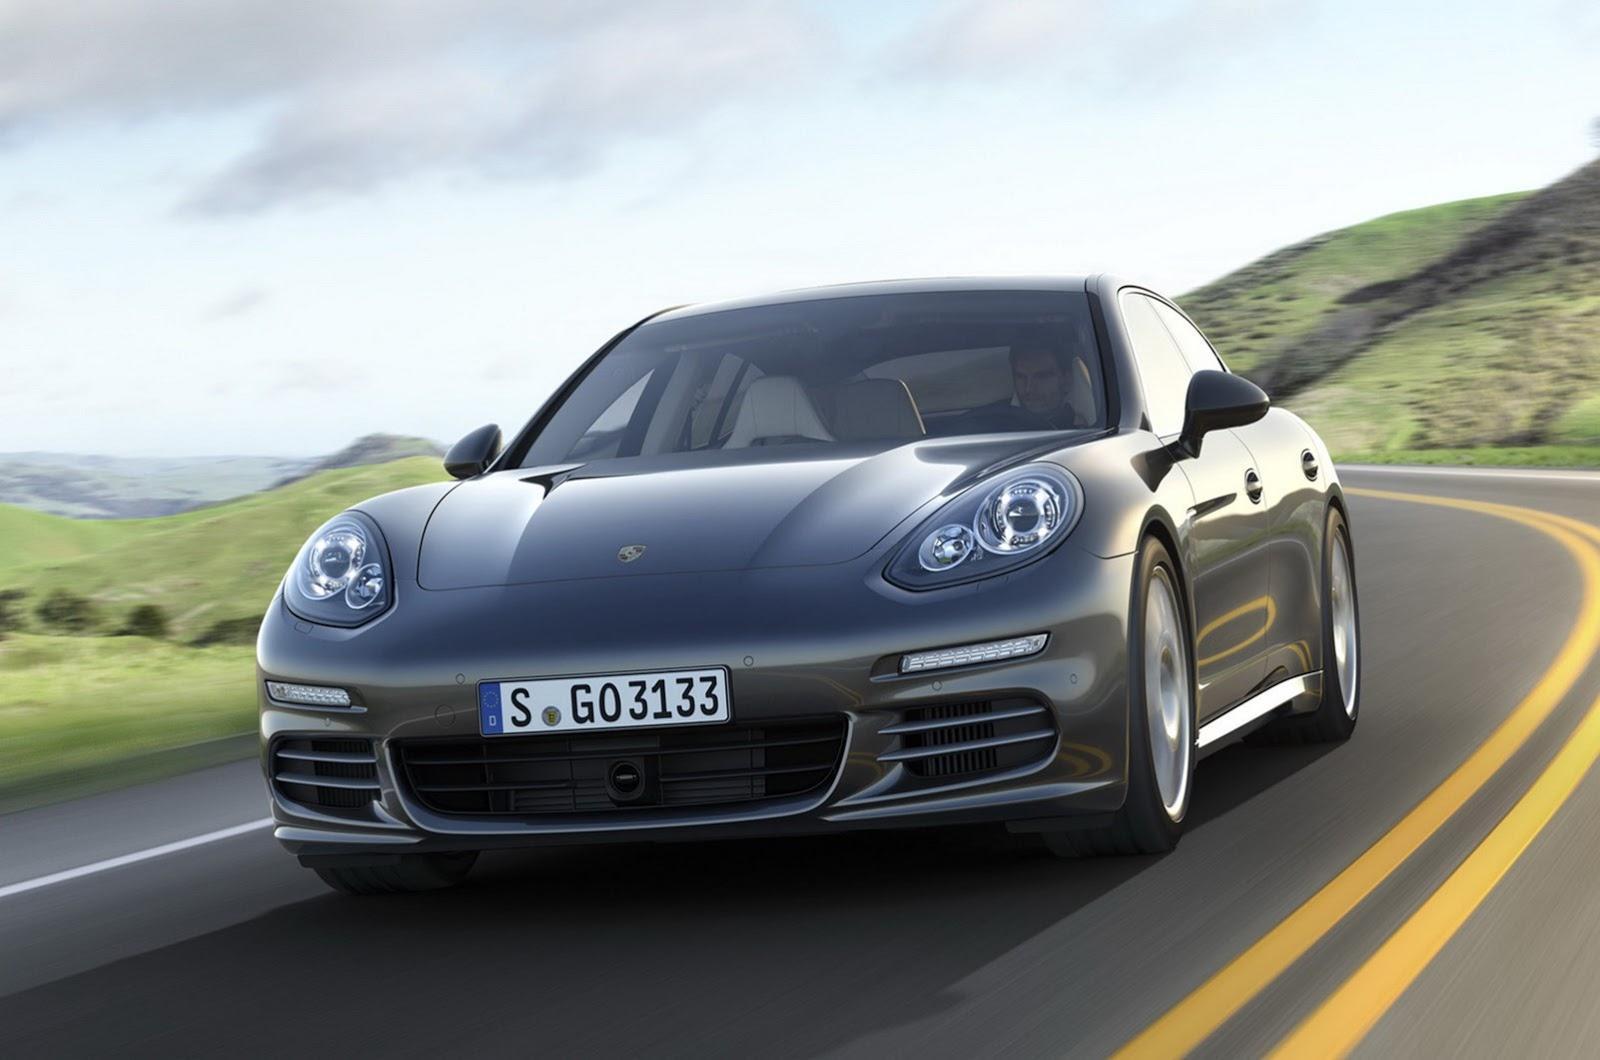 Foto de Porsche Panamera 2014 (filtradas) (4/9)